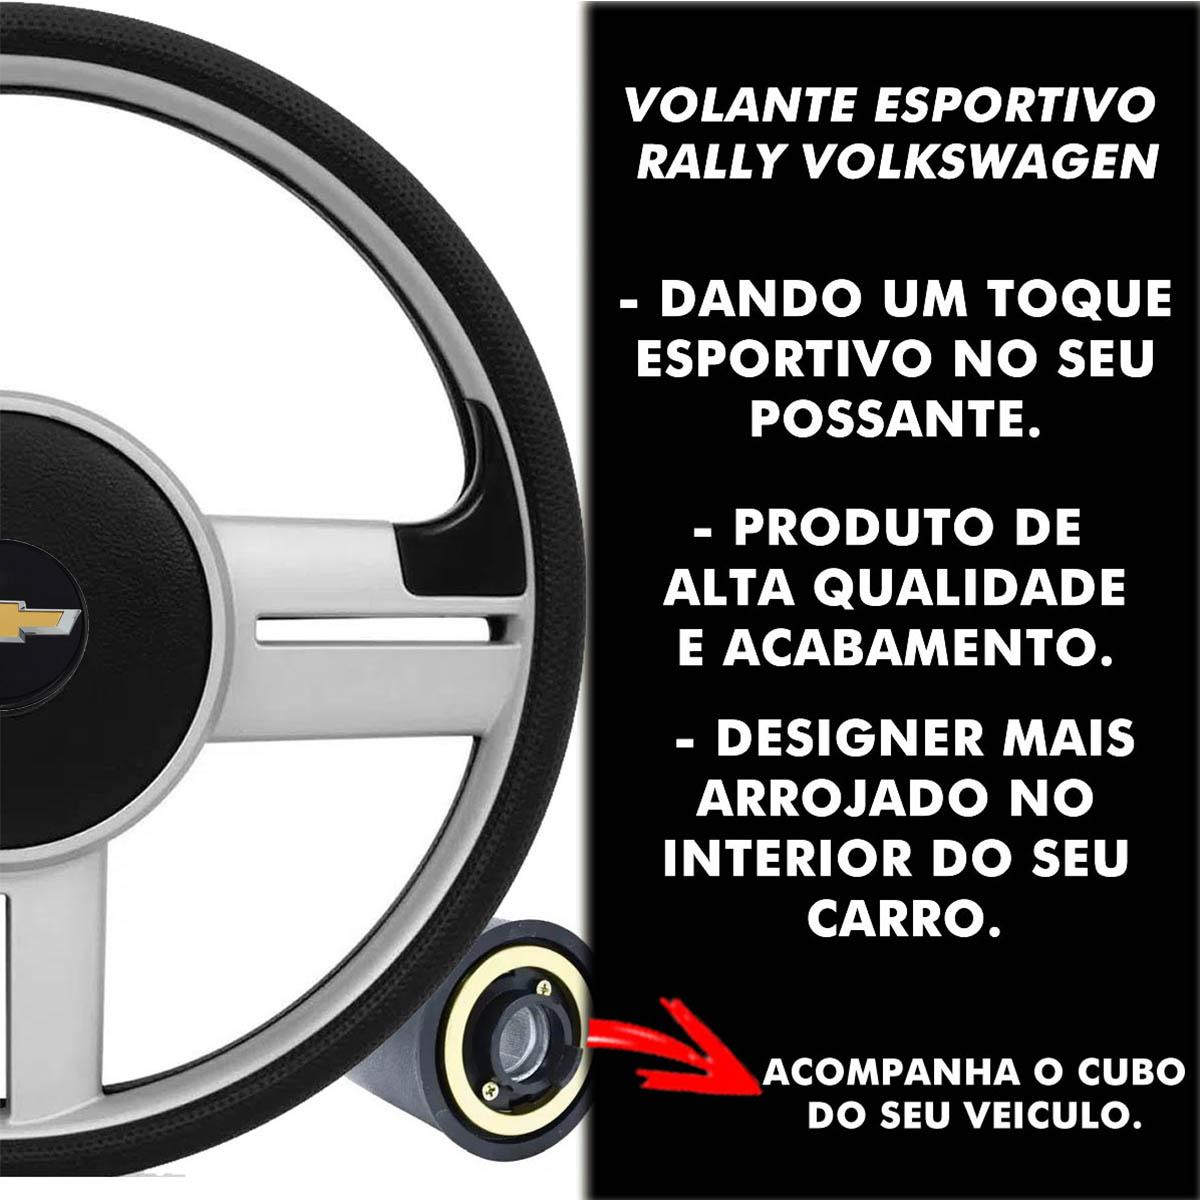 Volante Chevrolet Surf Rallye Esportivo Cubo da S10 Blazer Silverado 1995 a 2013 Opala Chevette 1968 a 1998 Poliparts